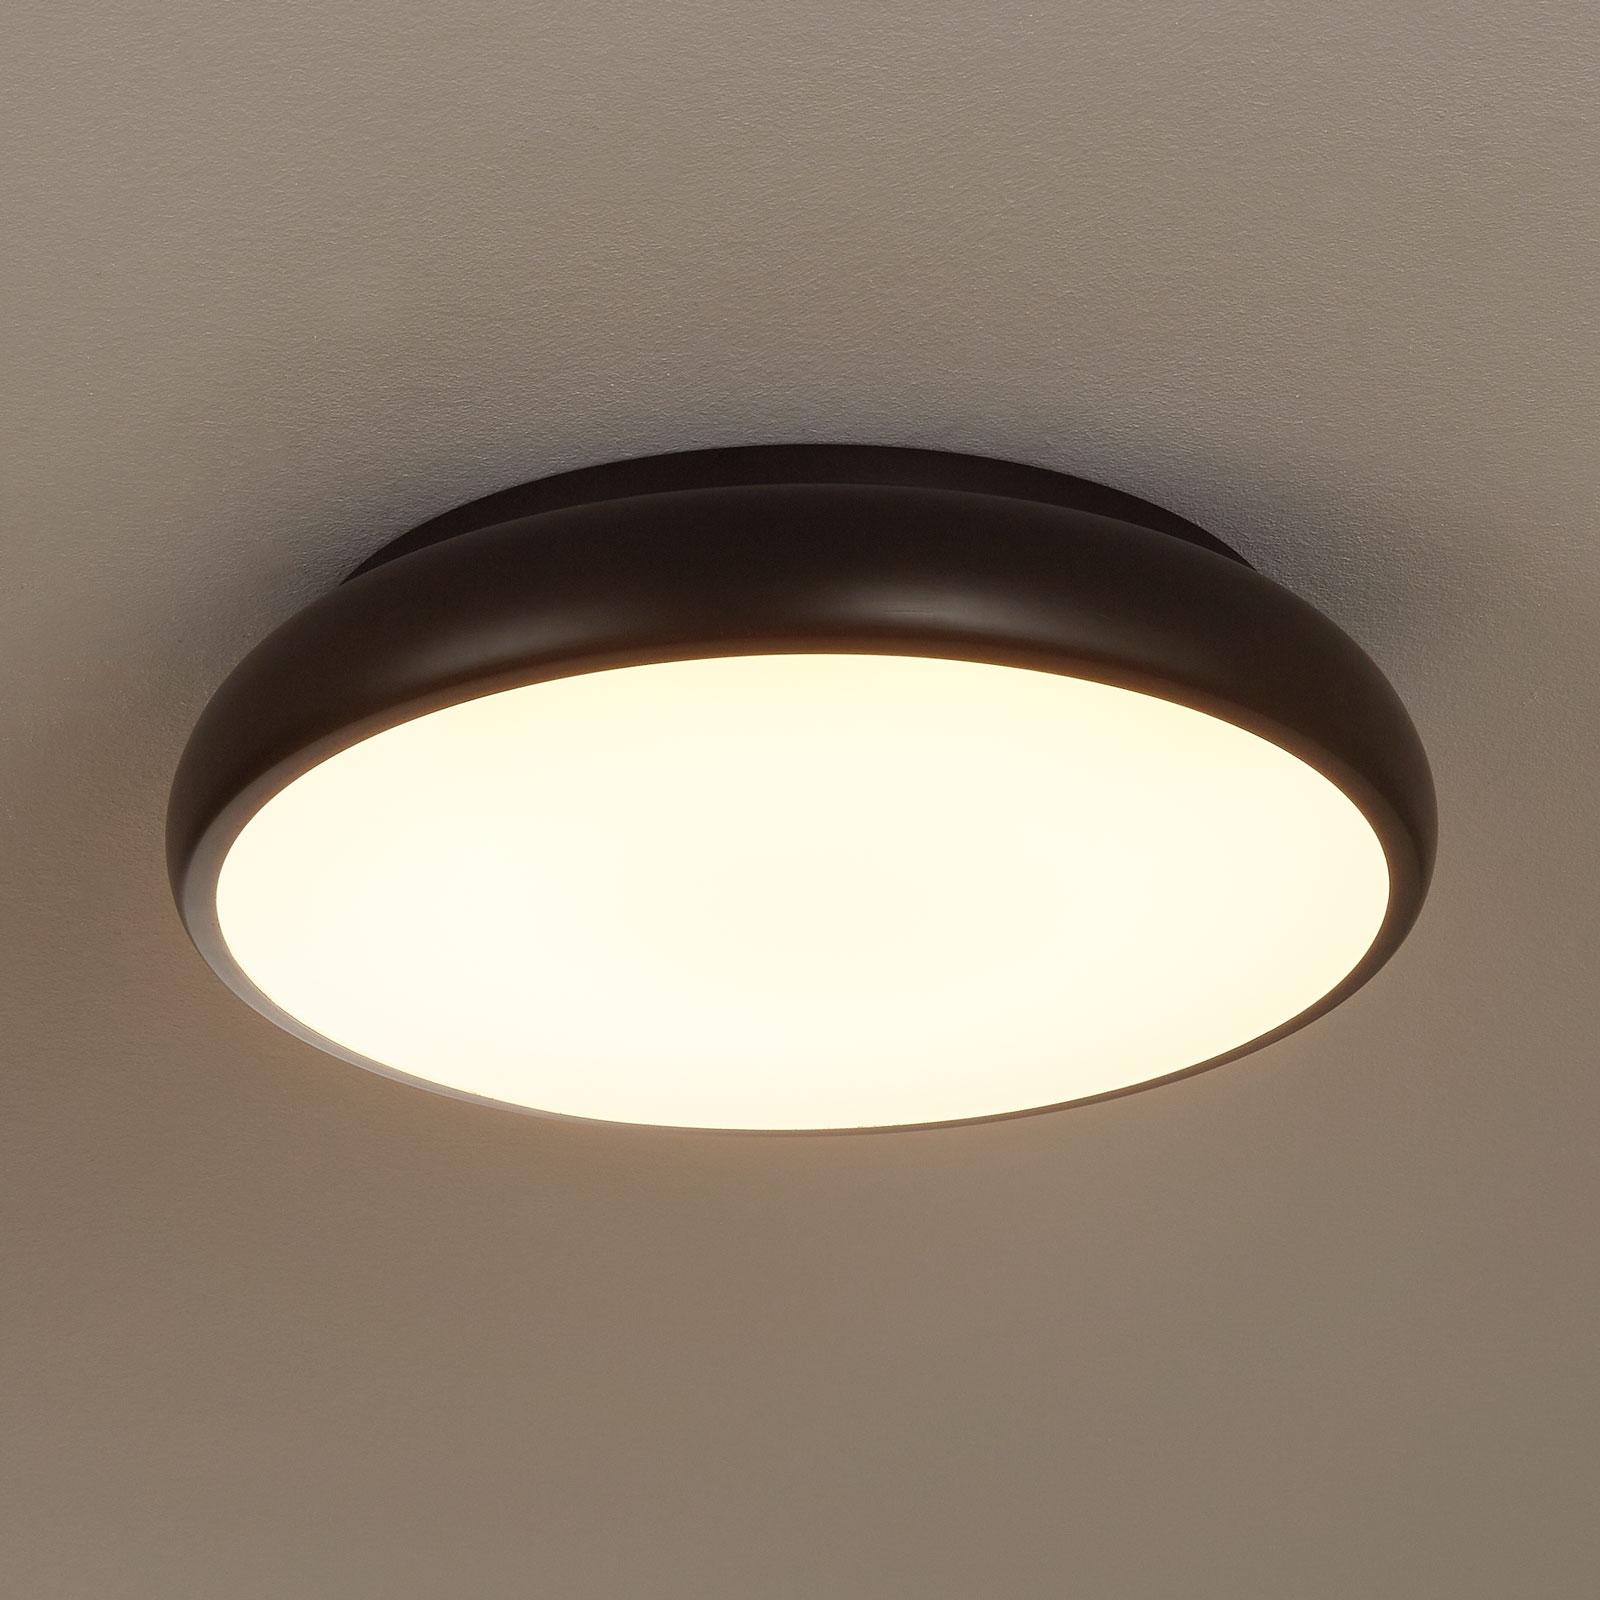 EGLO connect Riodeva-C lampa sufitowa LED czarna